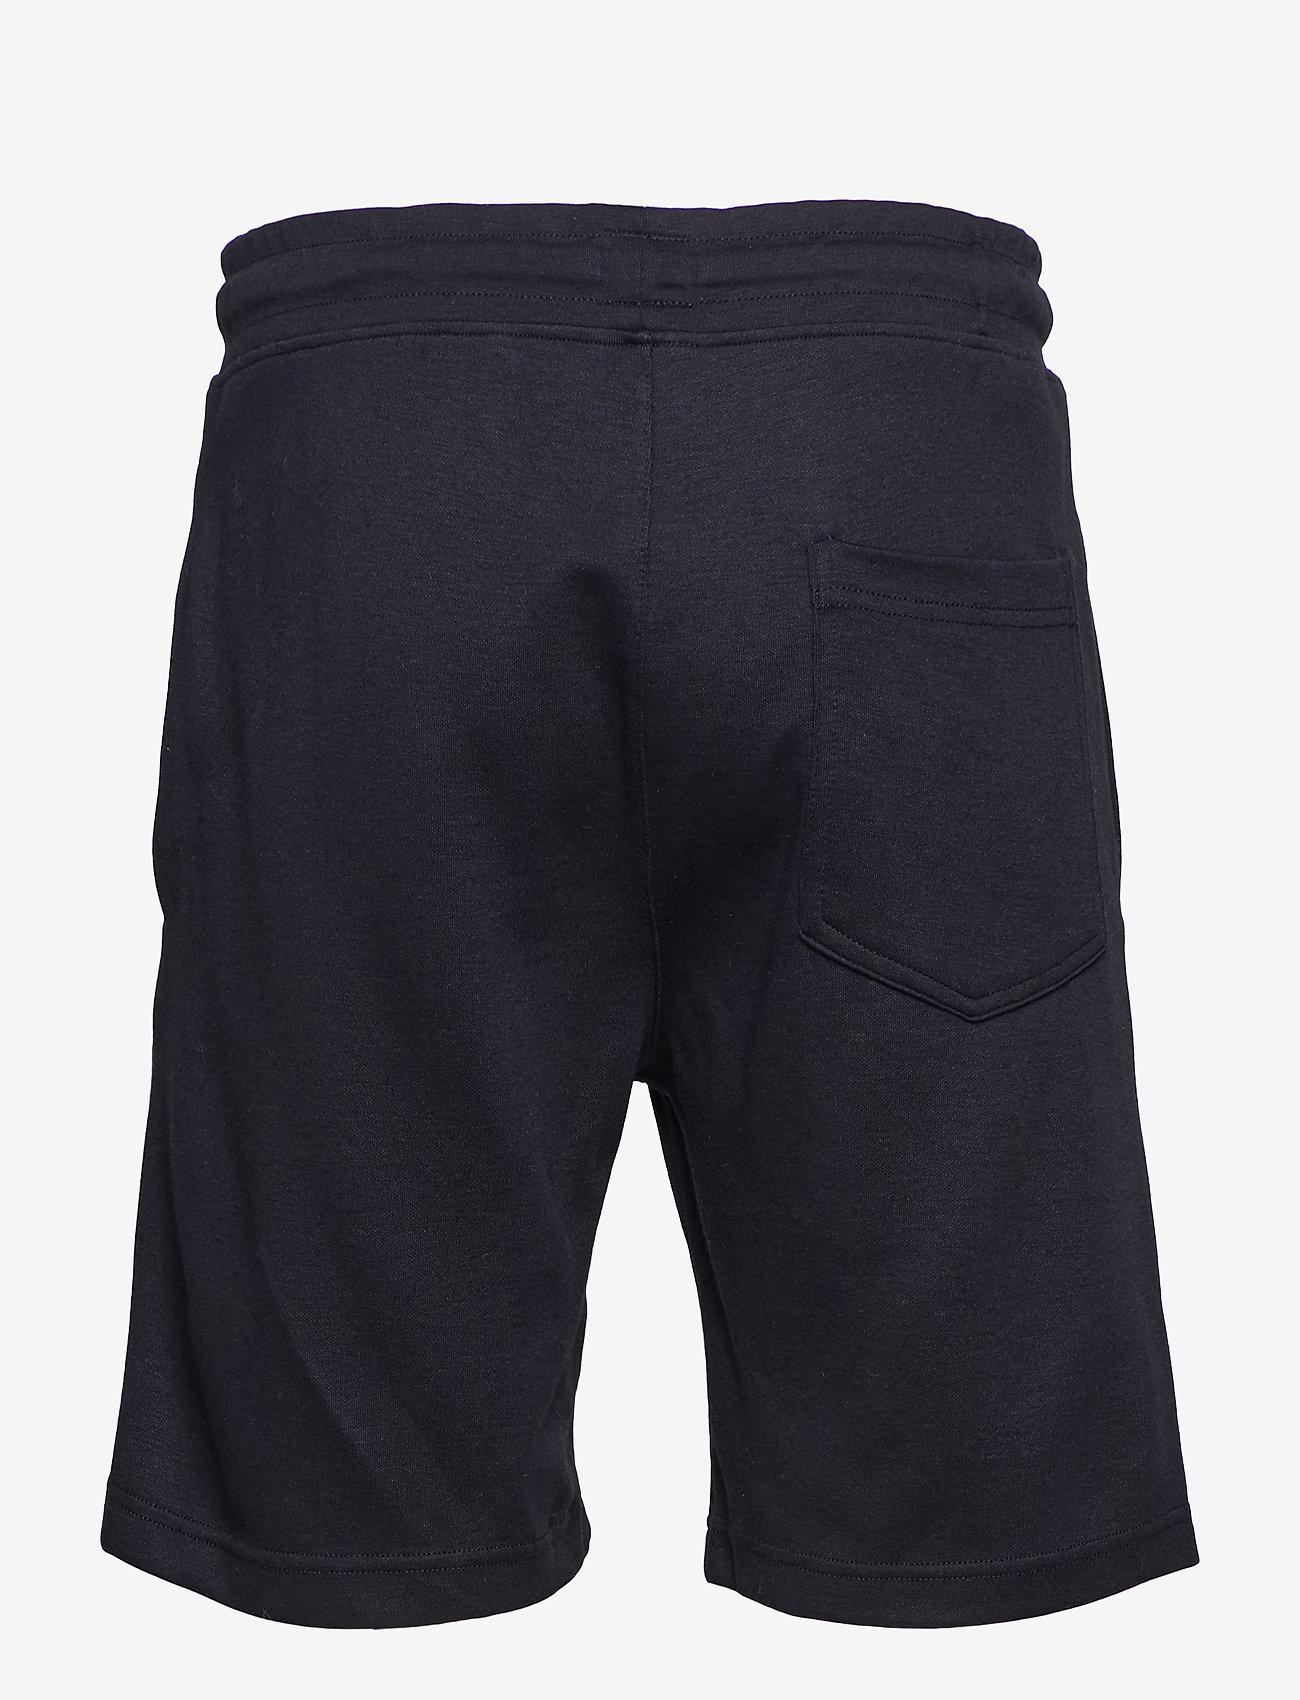 JBS of Denmark - JBS of Denmark, bamboo shorts - bottoms - black - 1